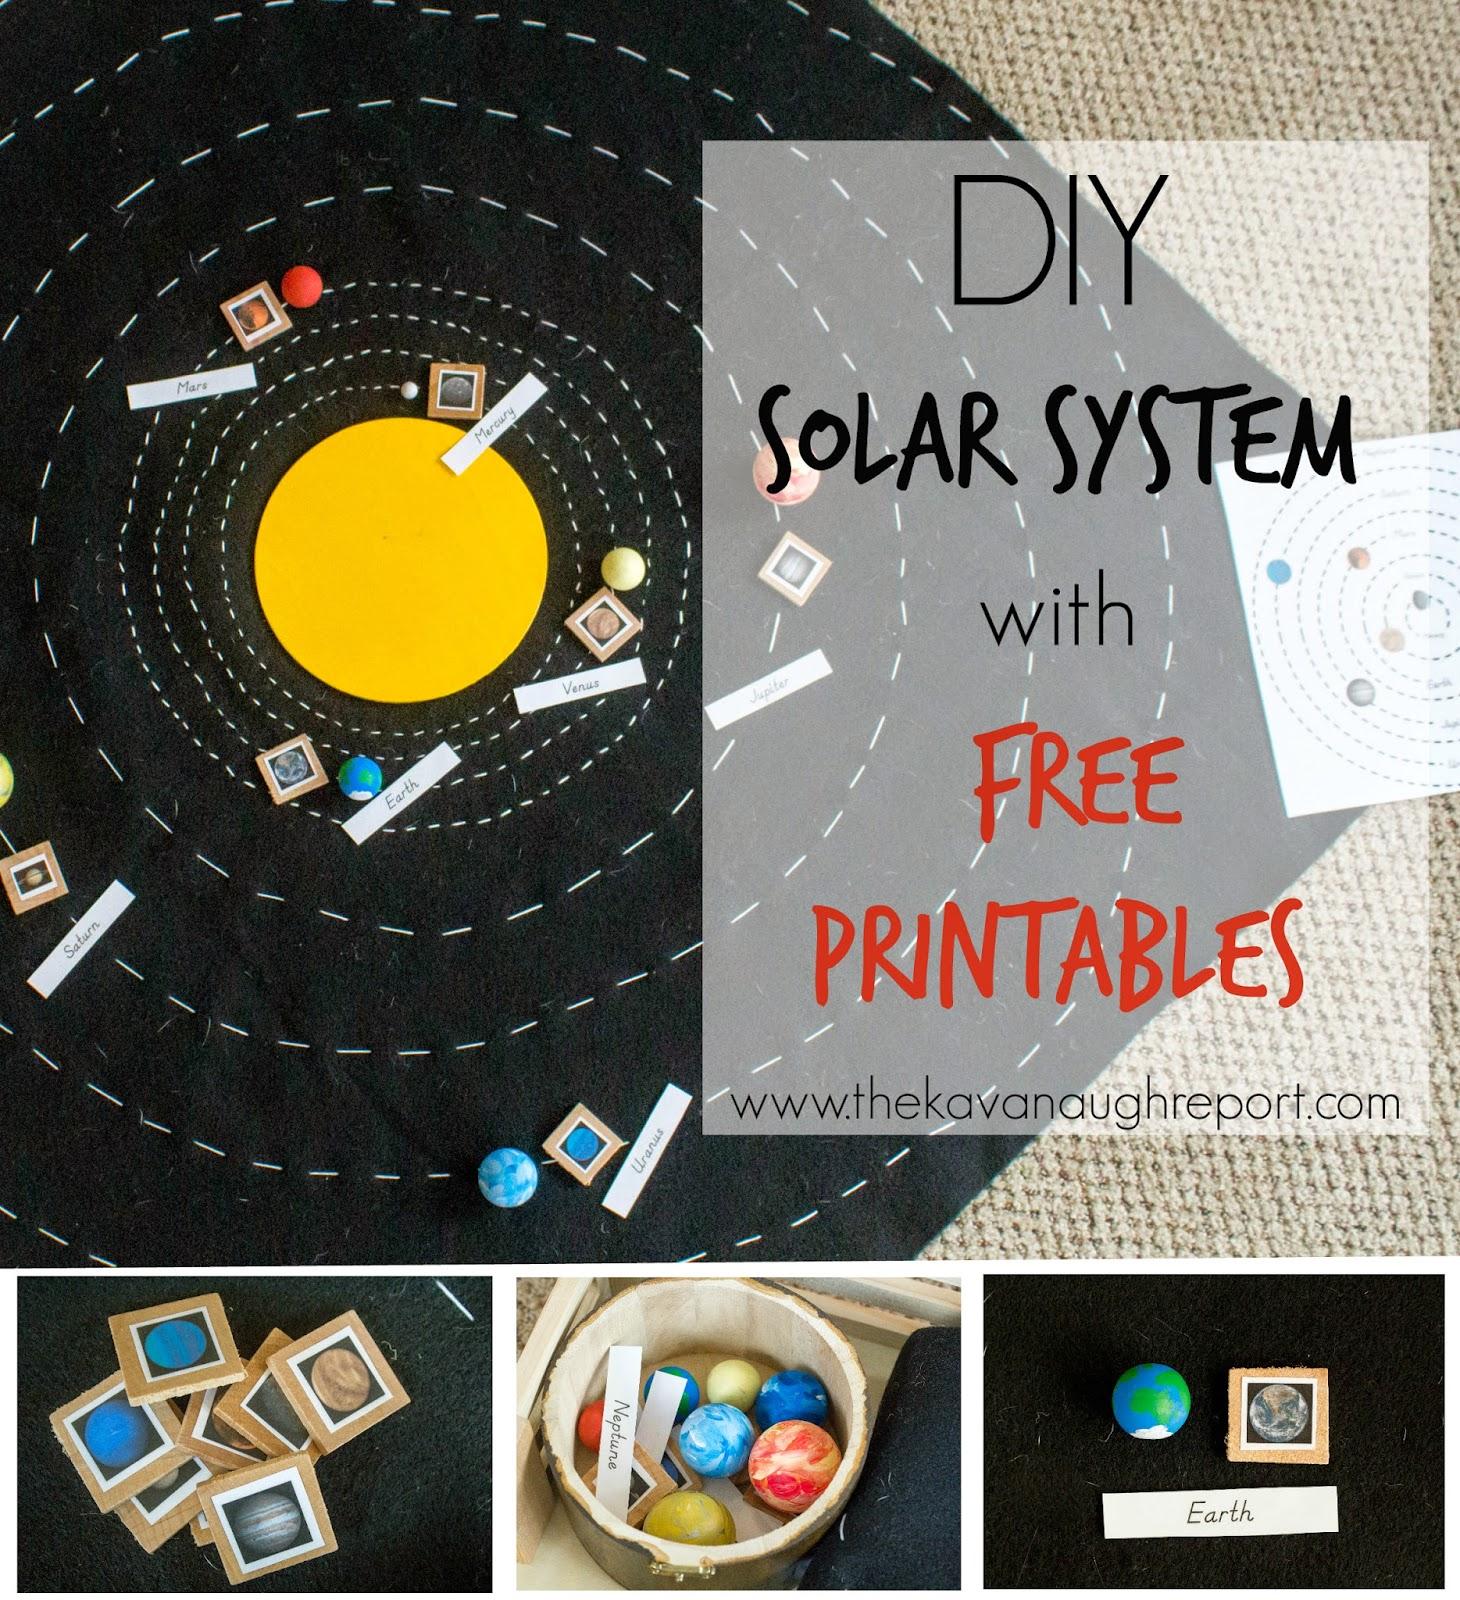 Montessori, space, solar system, printables, preschool